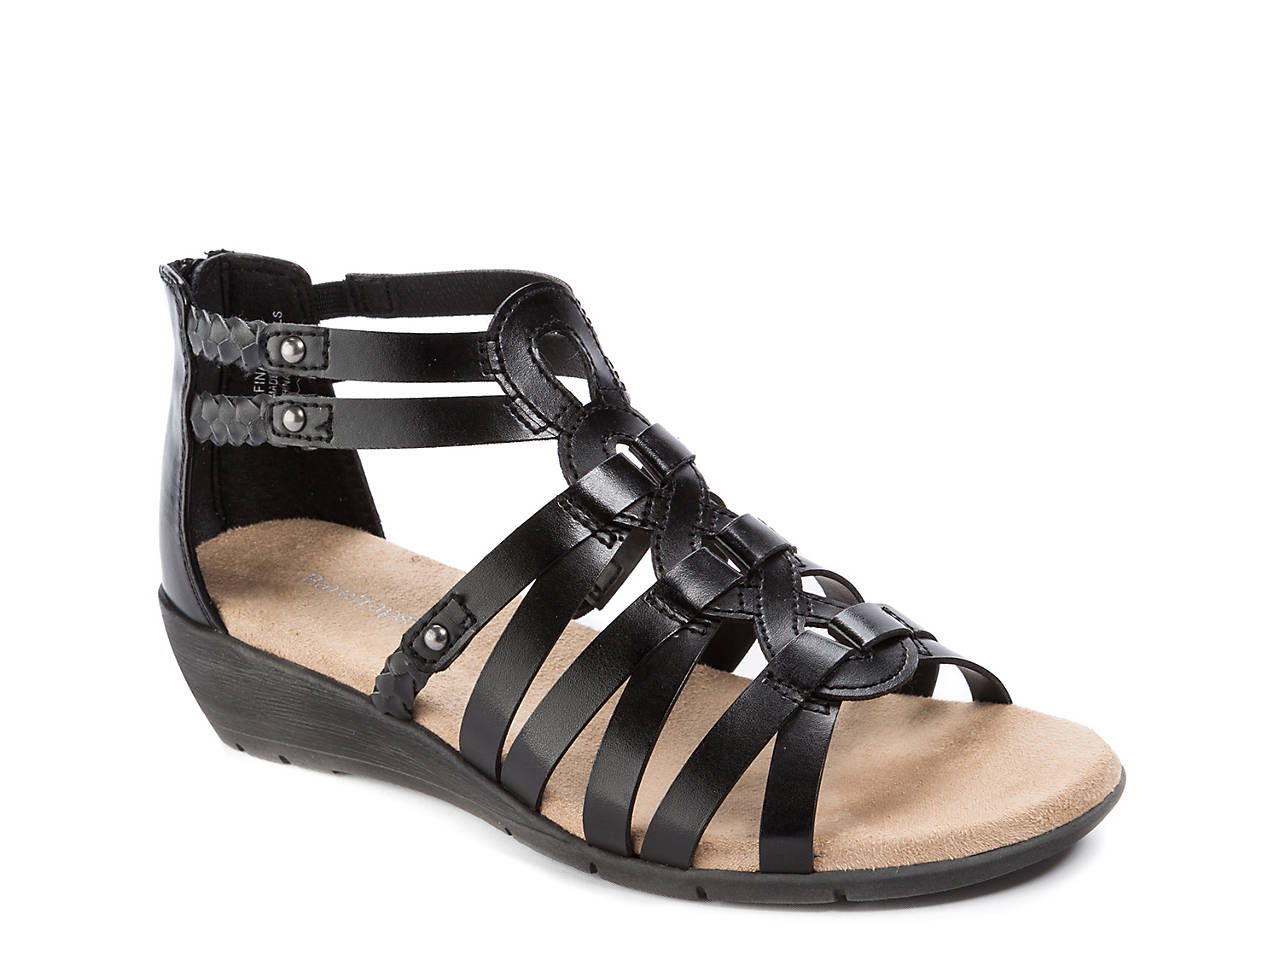 ceae0862560e9 Delfina Wedge Sandal